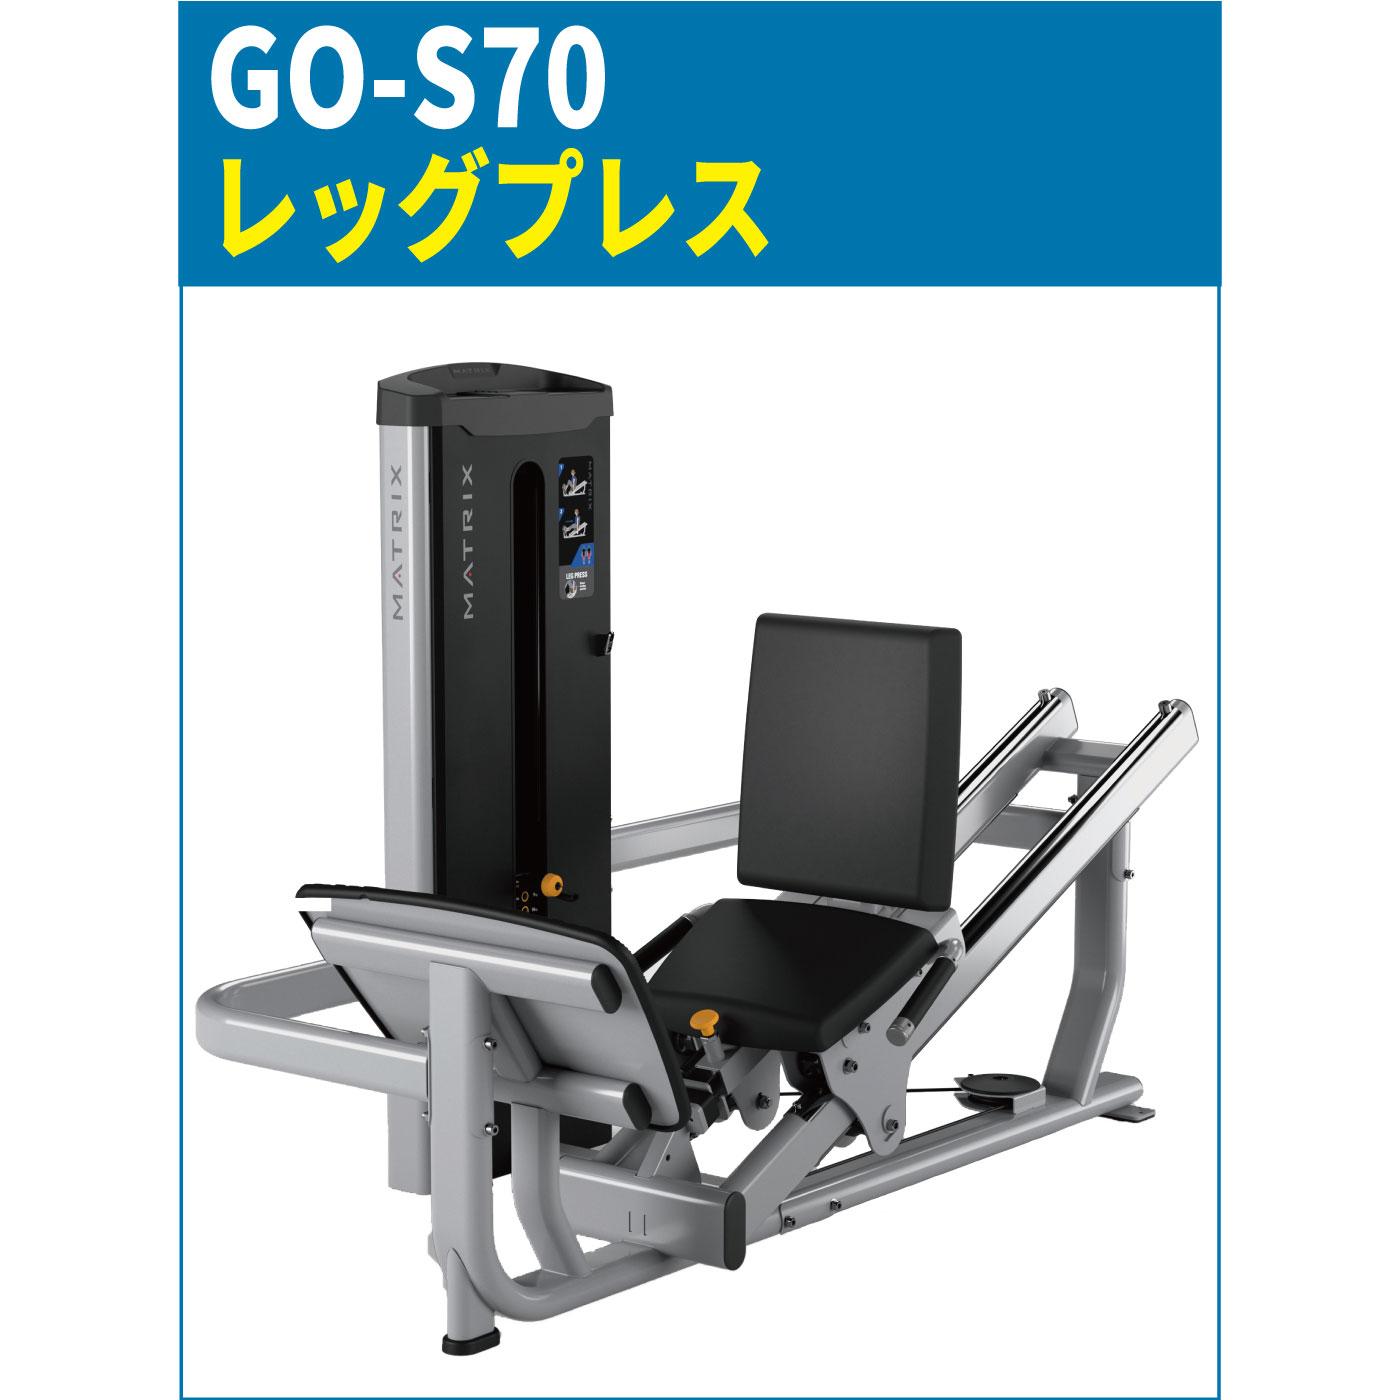 GO-S70のレッグプレス